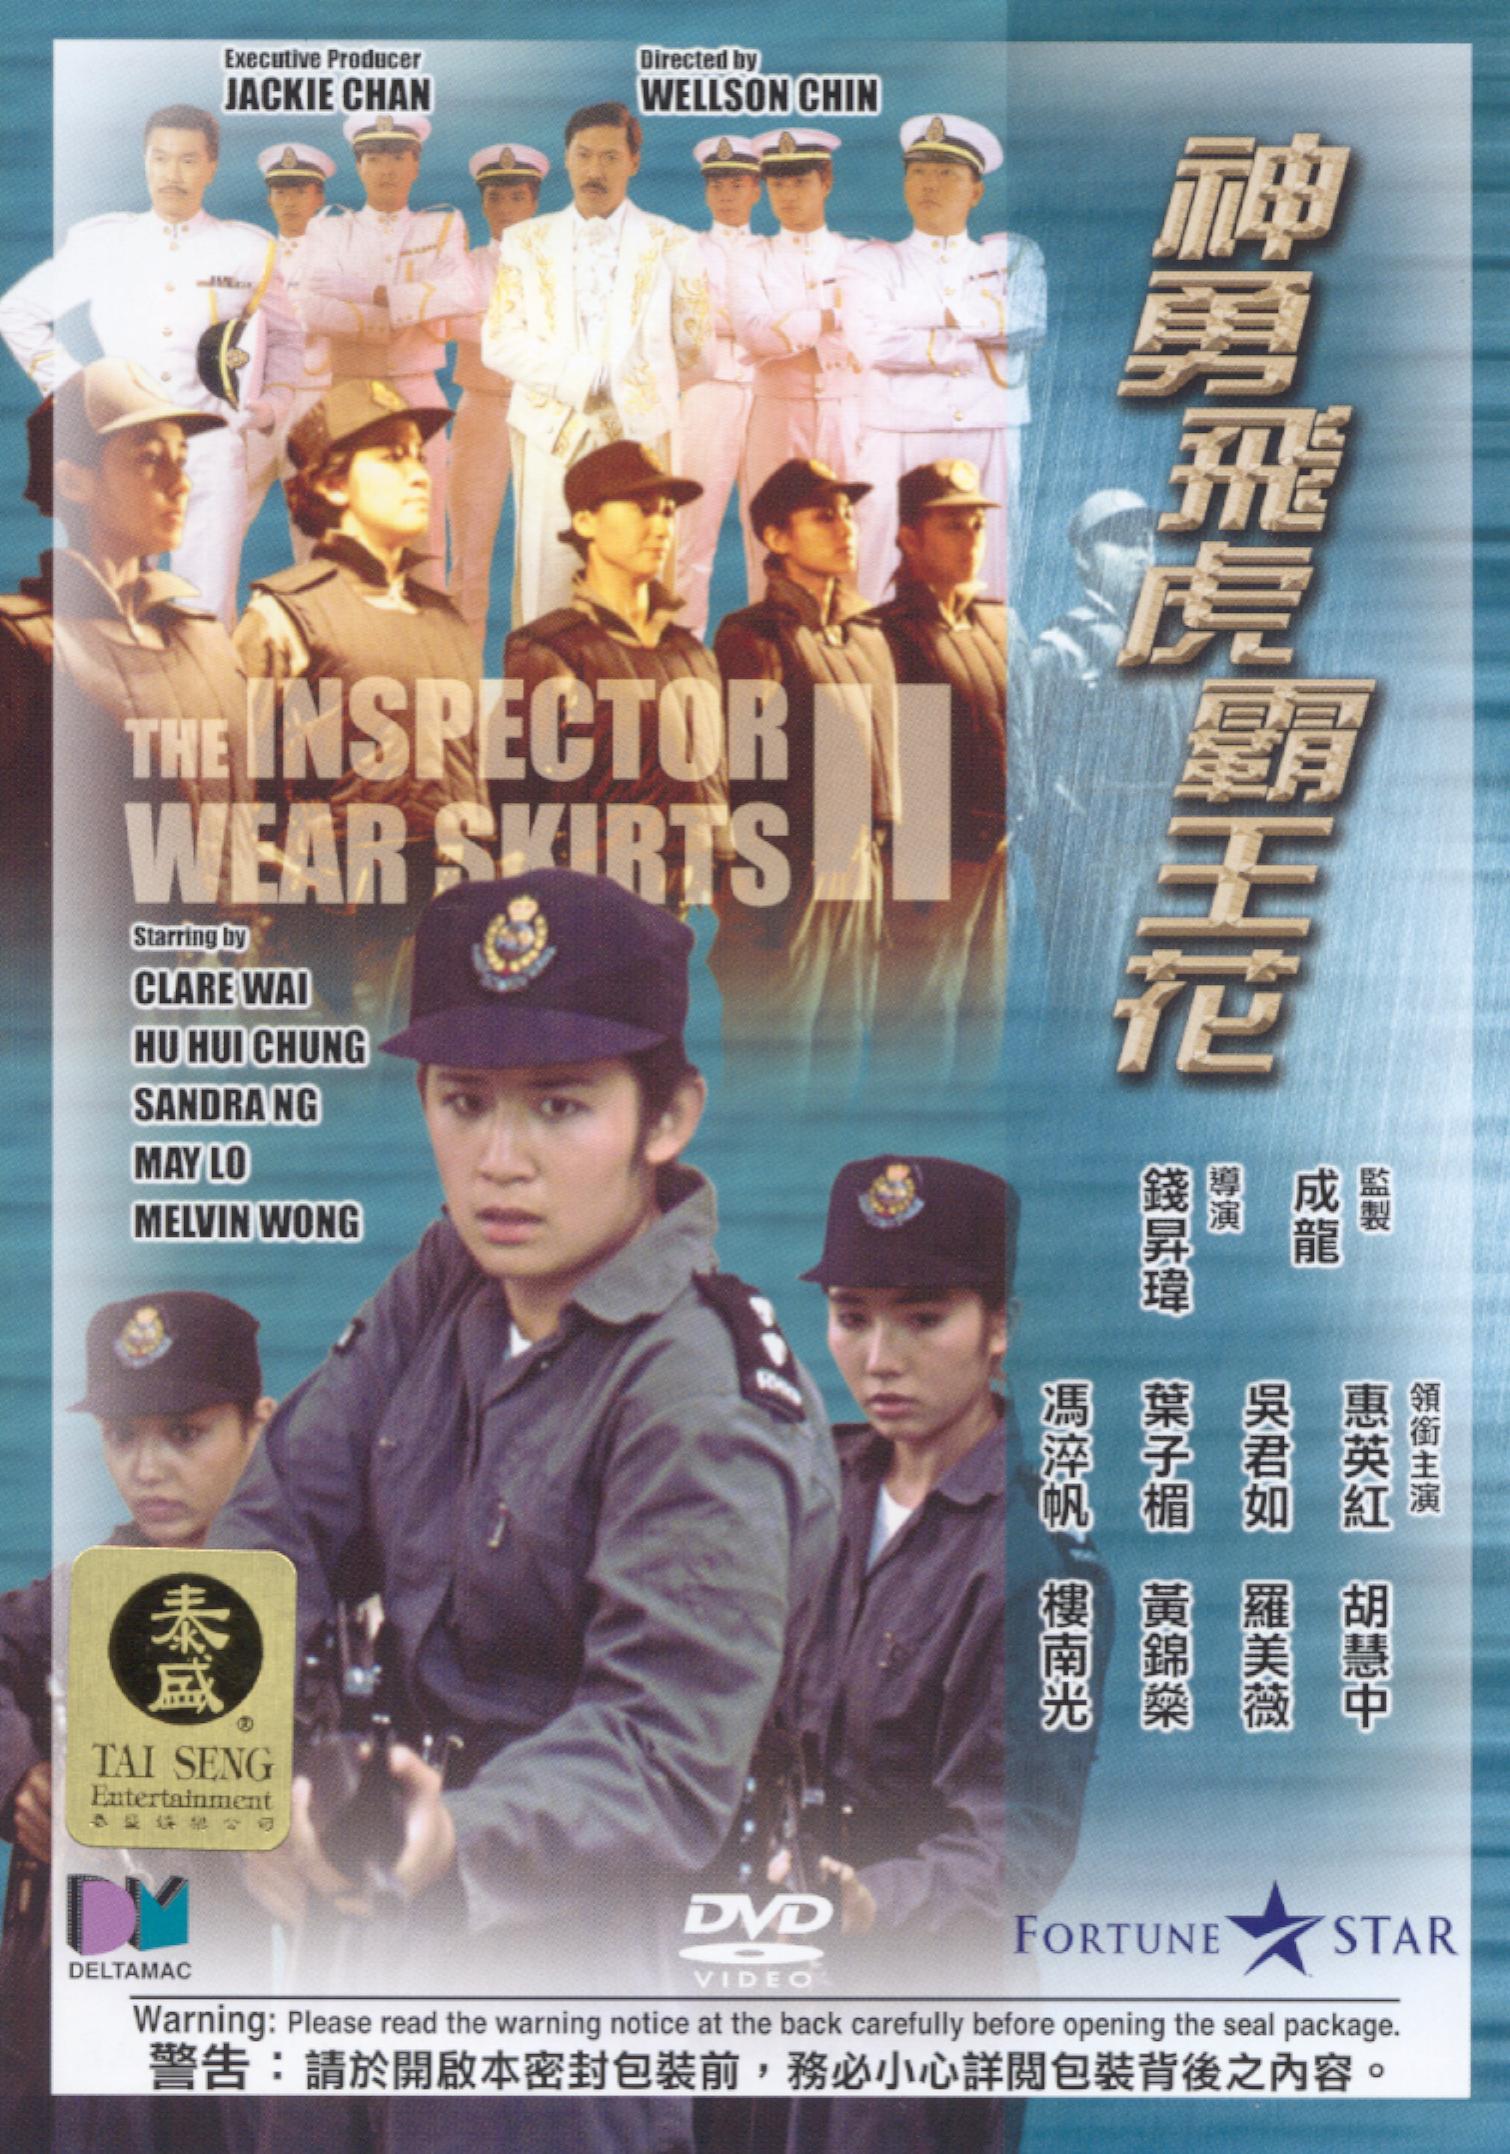 The Inspector Wears Skirts II